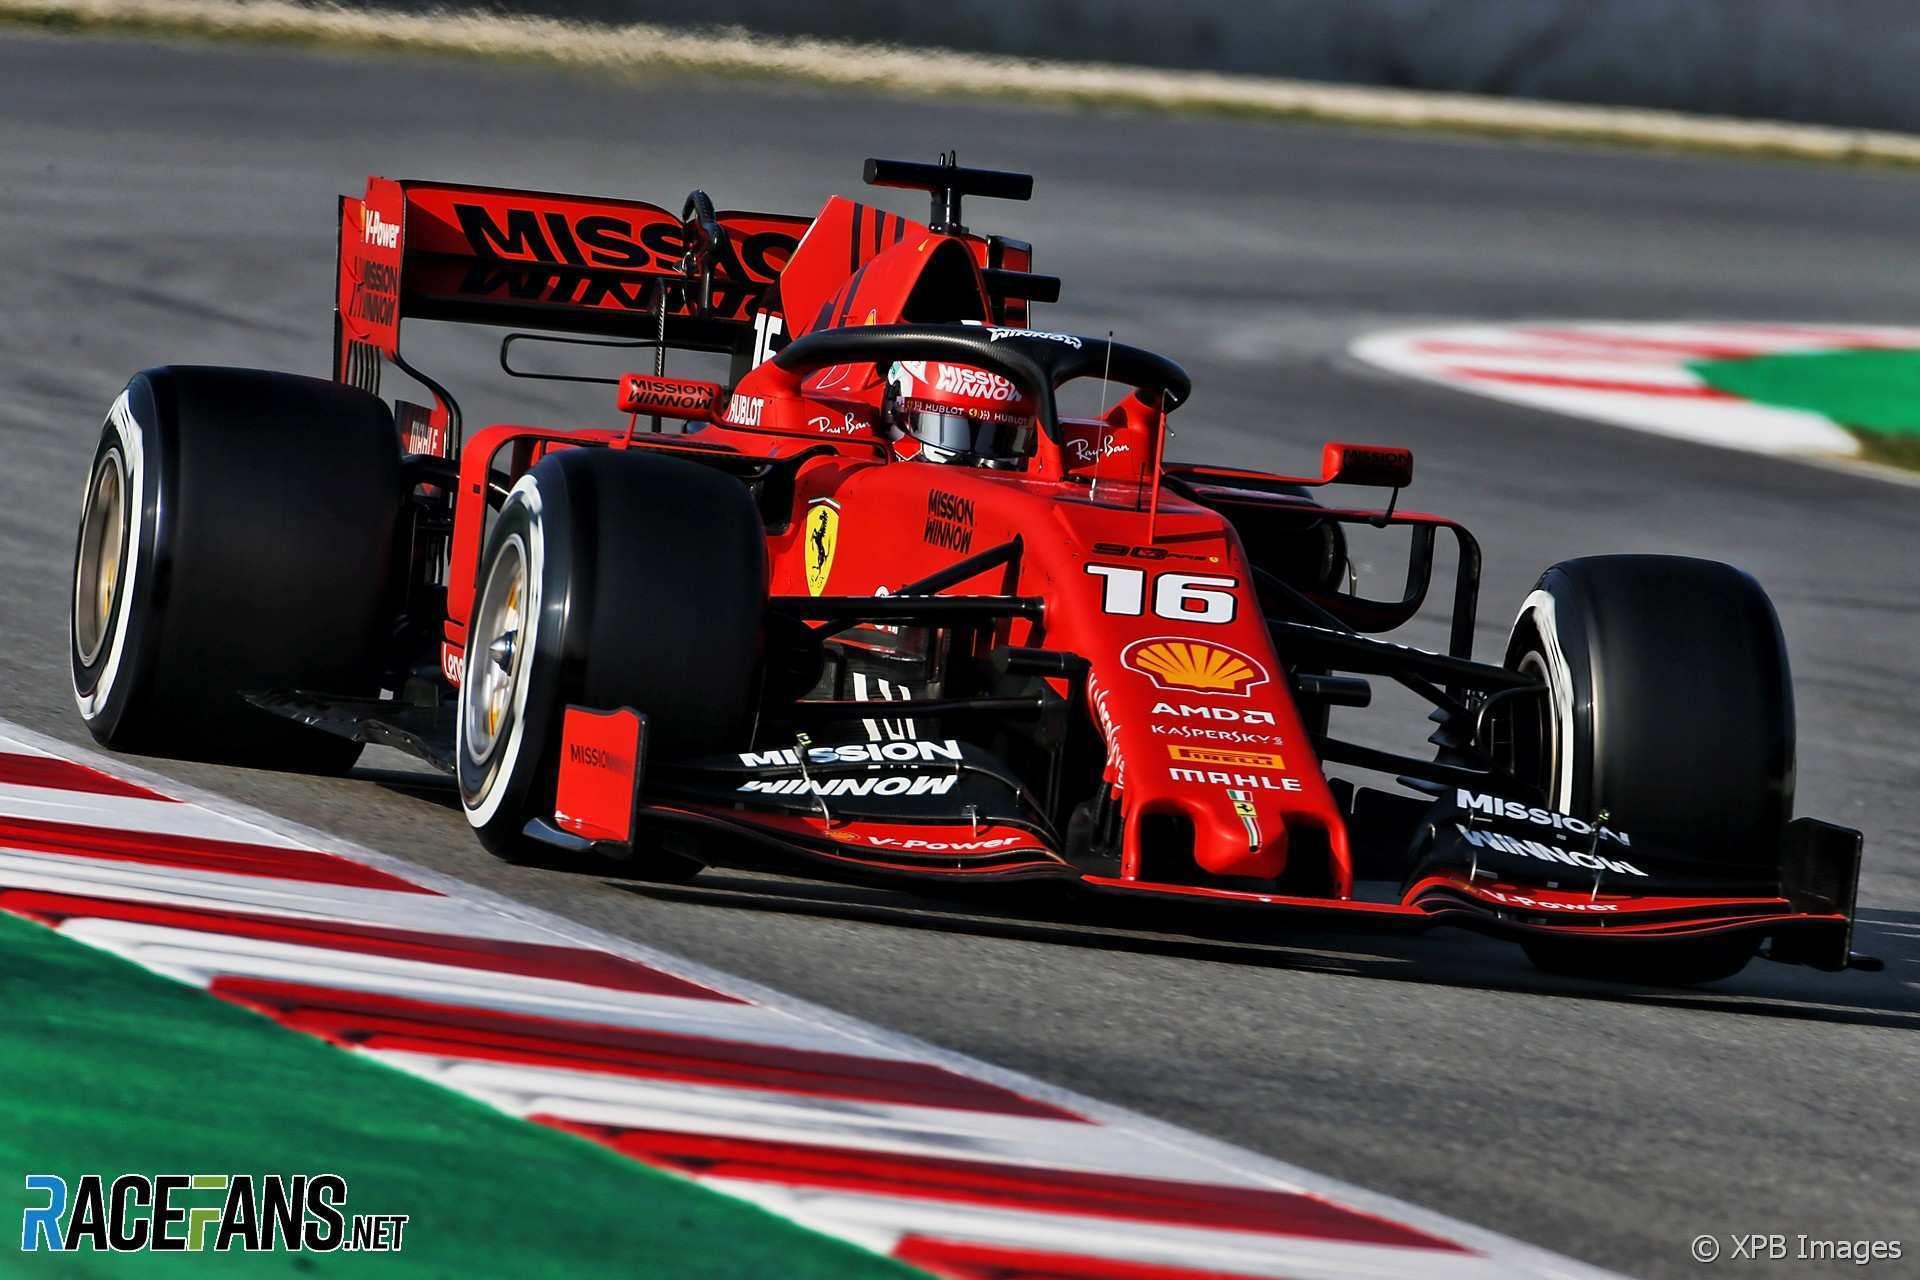 68 Best Review Best Ferrari Leclerc 2019 Specs And Review History with Best Ferrari Leclerc 2019 Specs And Review